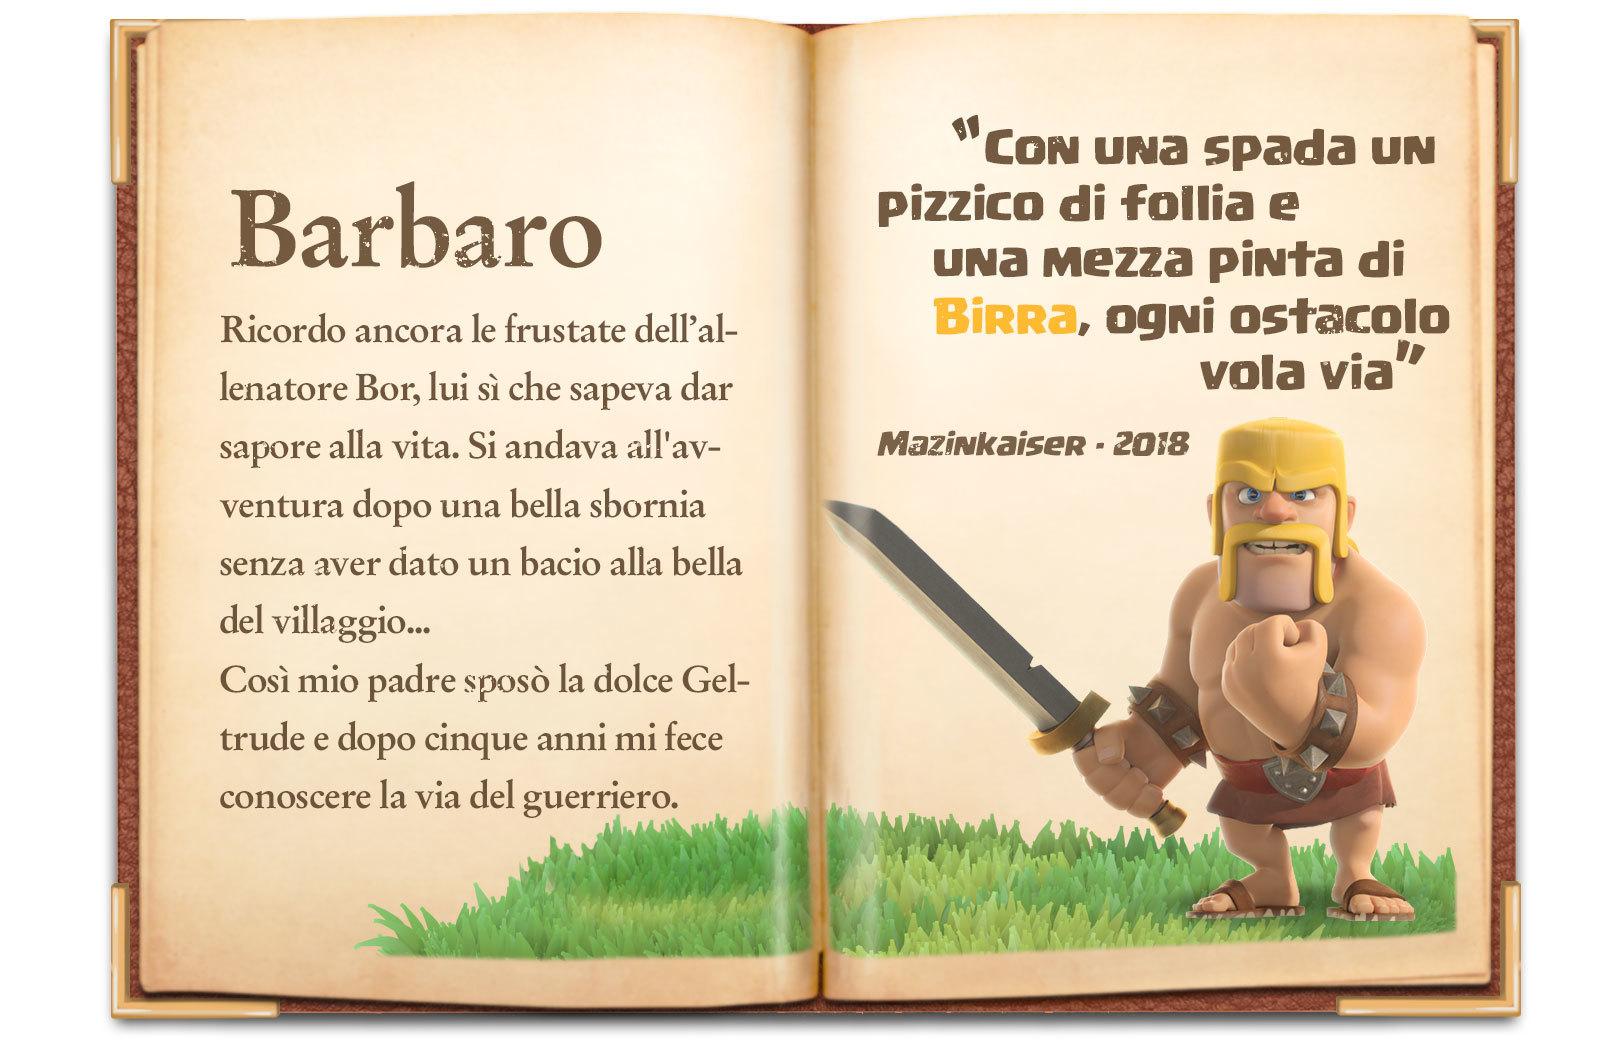 Ita_CoC_Clanslator_Book_1_BarbaroFull.jpg?mtime=20180601060637#asset:5850